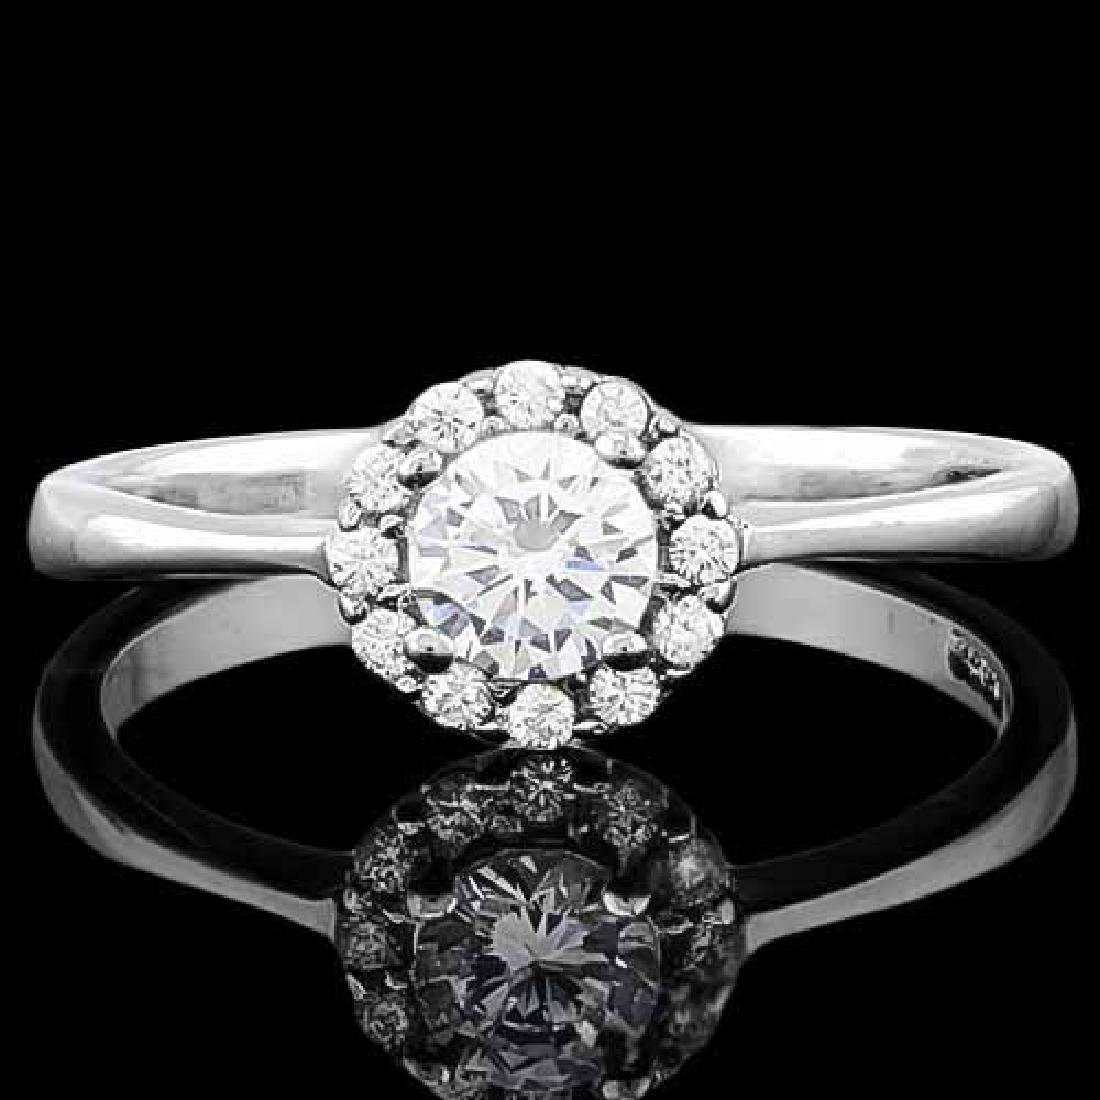 3/5 CARAT (13 PCS) FLAWLESS CREATED DIAMOND 925 STERLIN